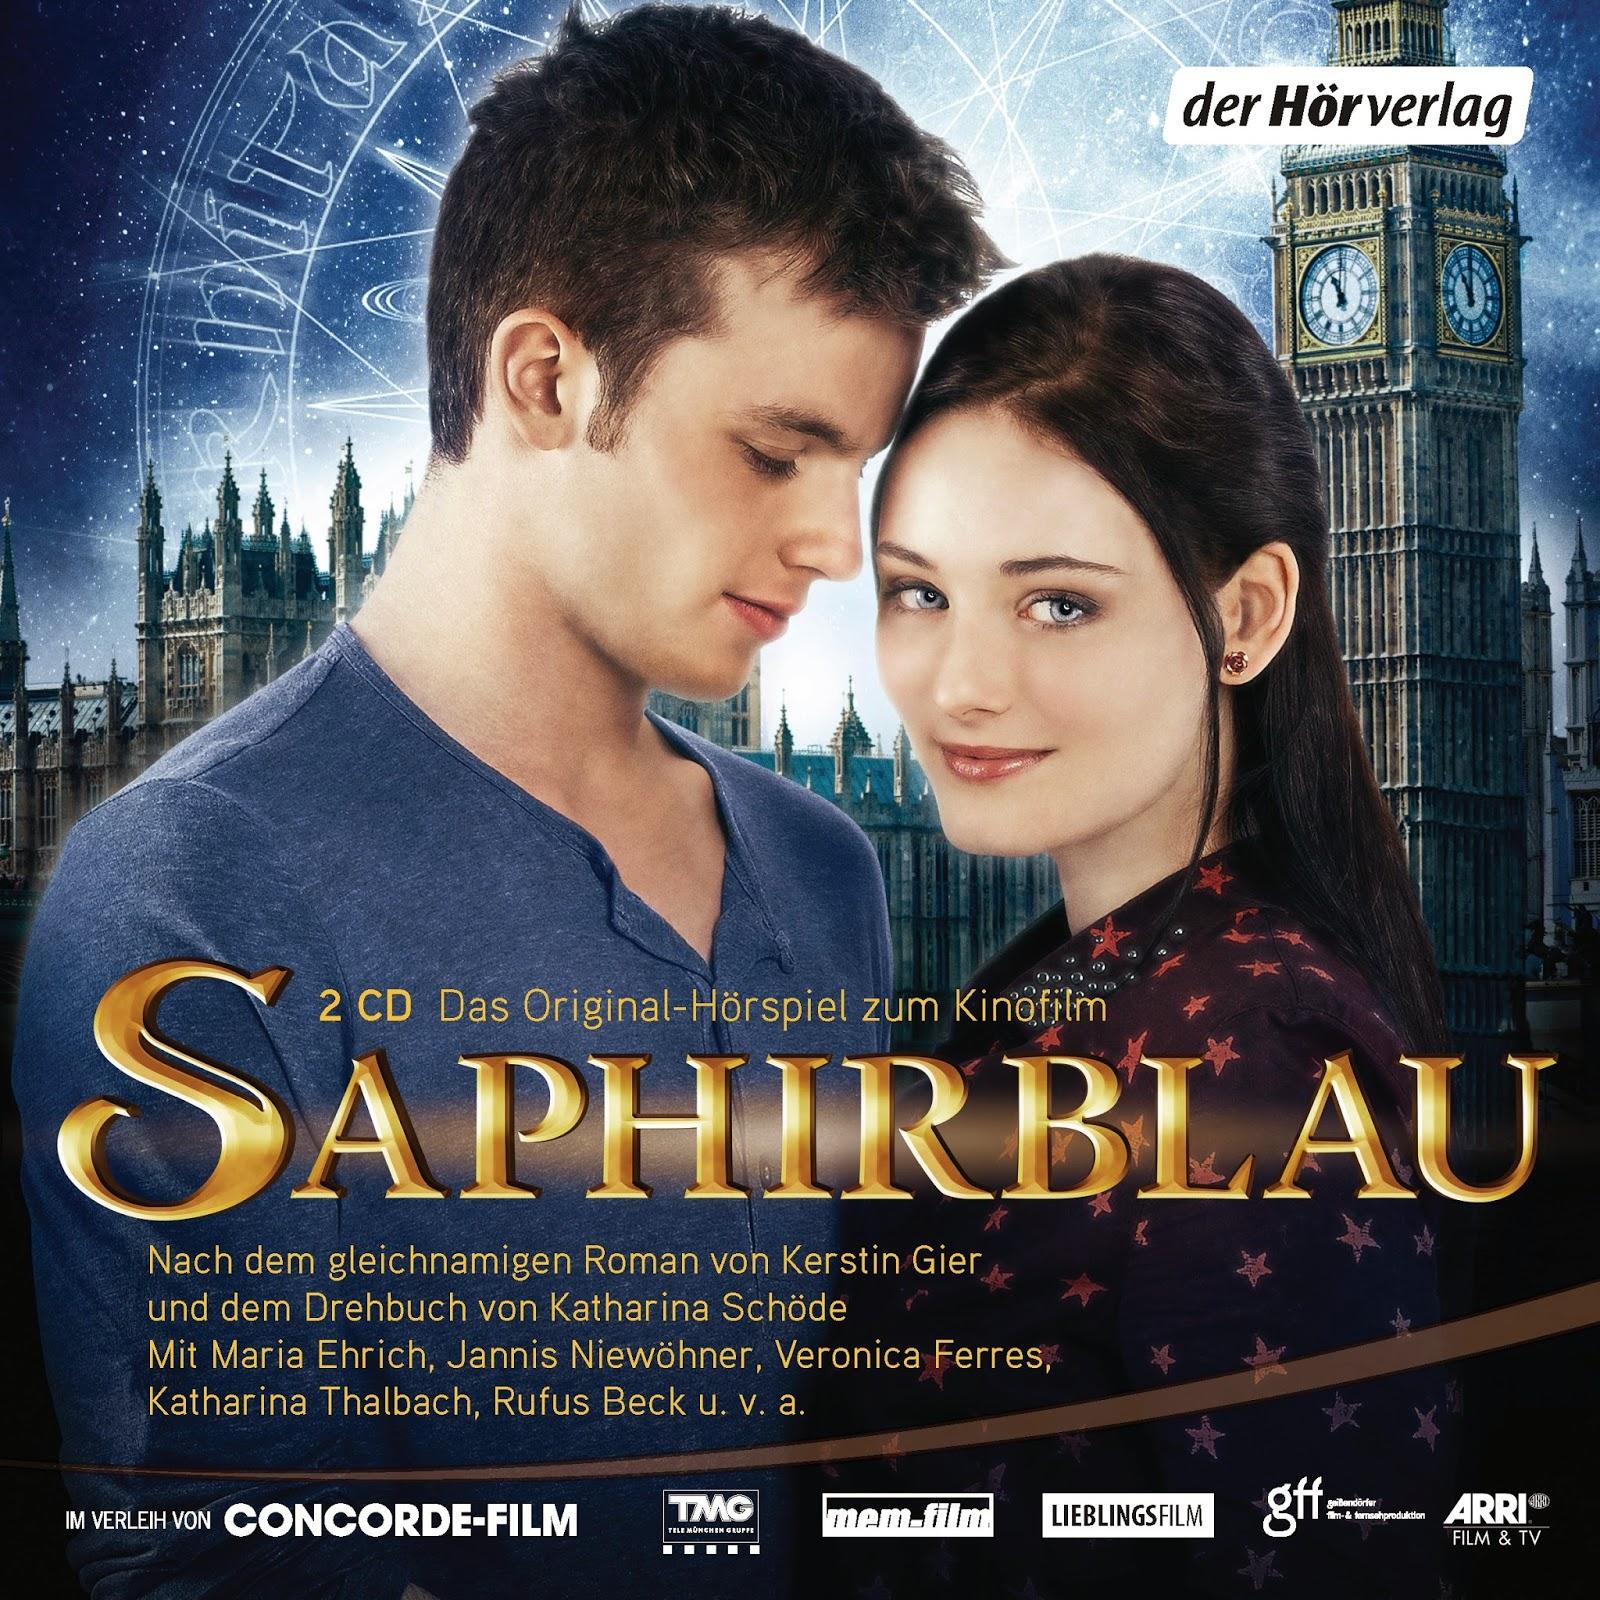 http://www.amazon.de/Saphirblau-Filmh%C3%B6rspiel-Kerstin-Gier/dp/3844515747/ref=sr_1_10_bnp_1_aud?ie=UTF8&qid=1408193739&sr=8-10&keywords=saphirblau